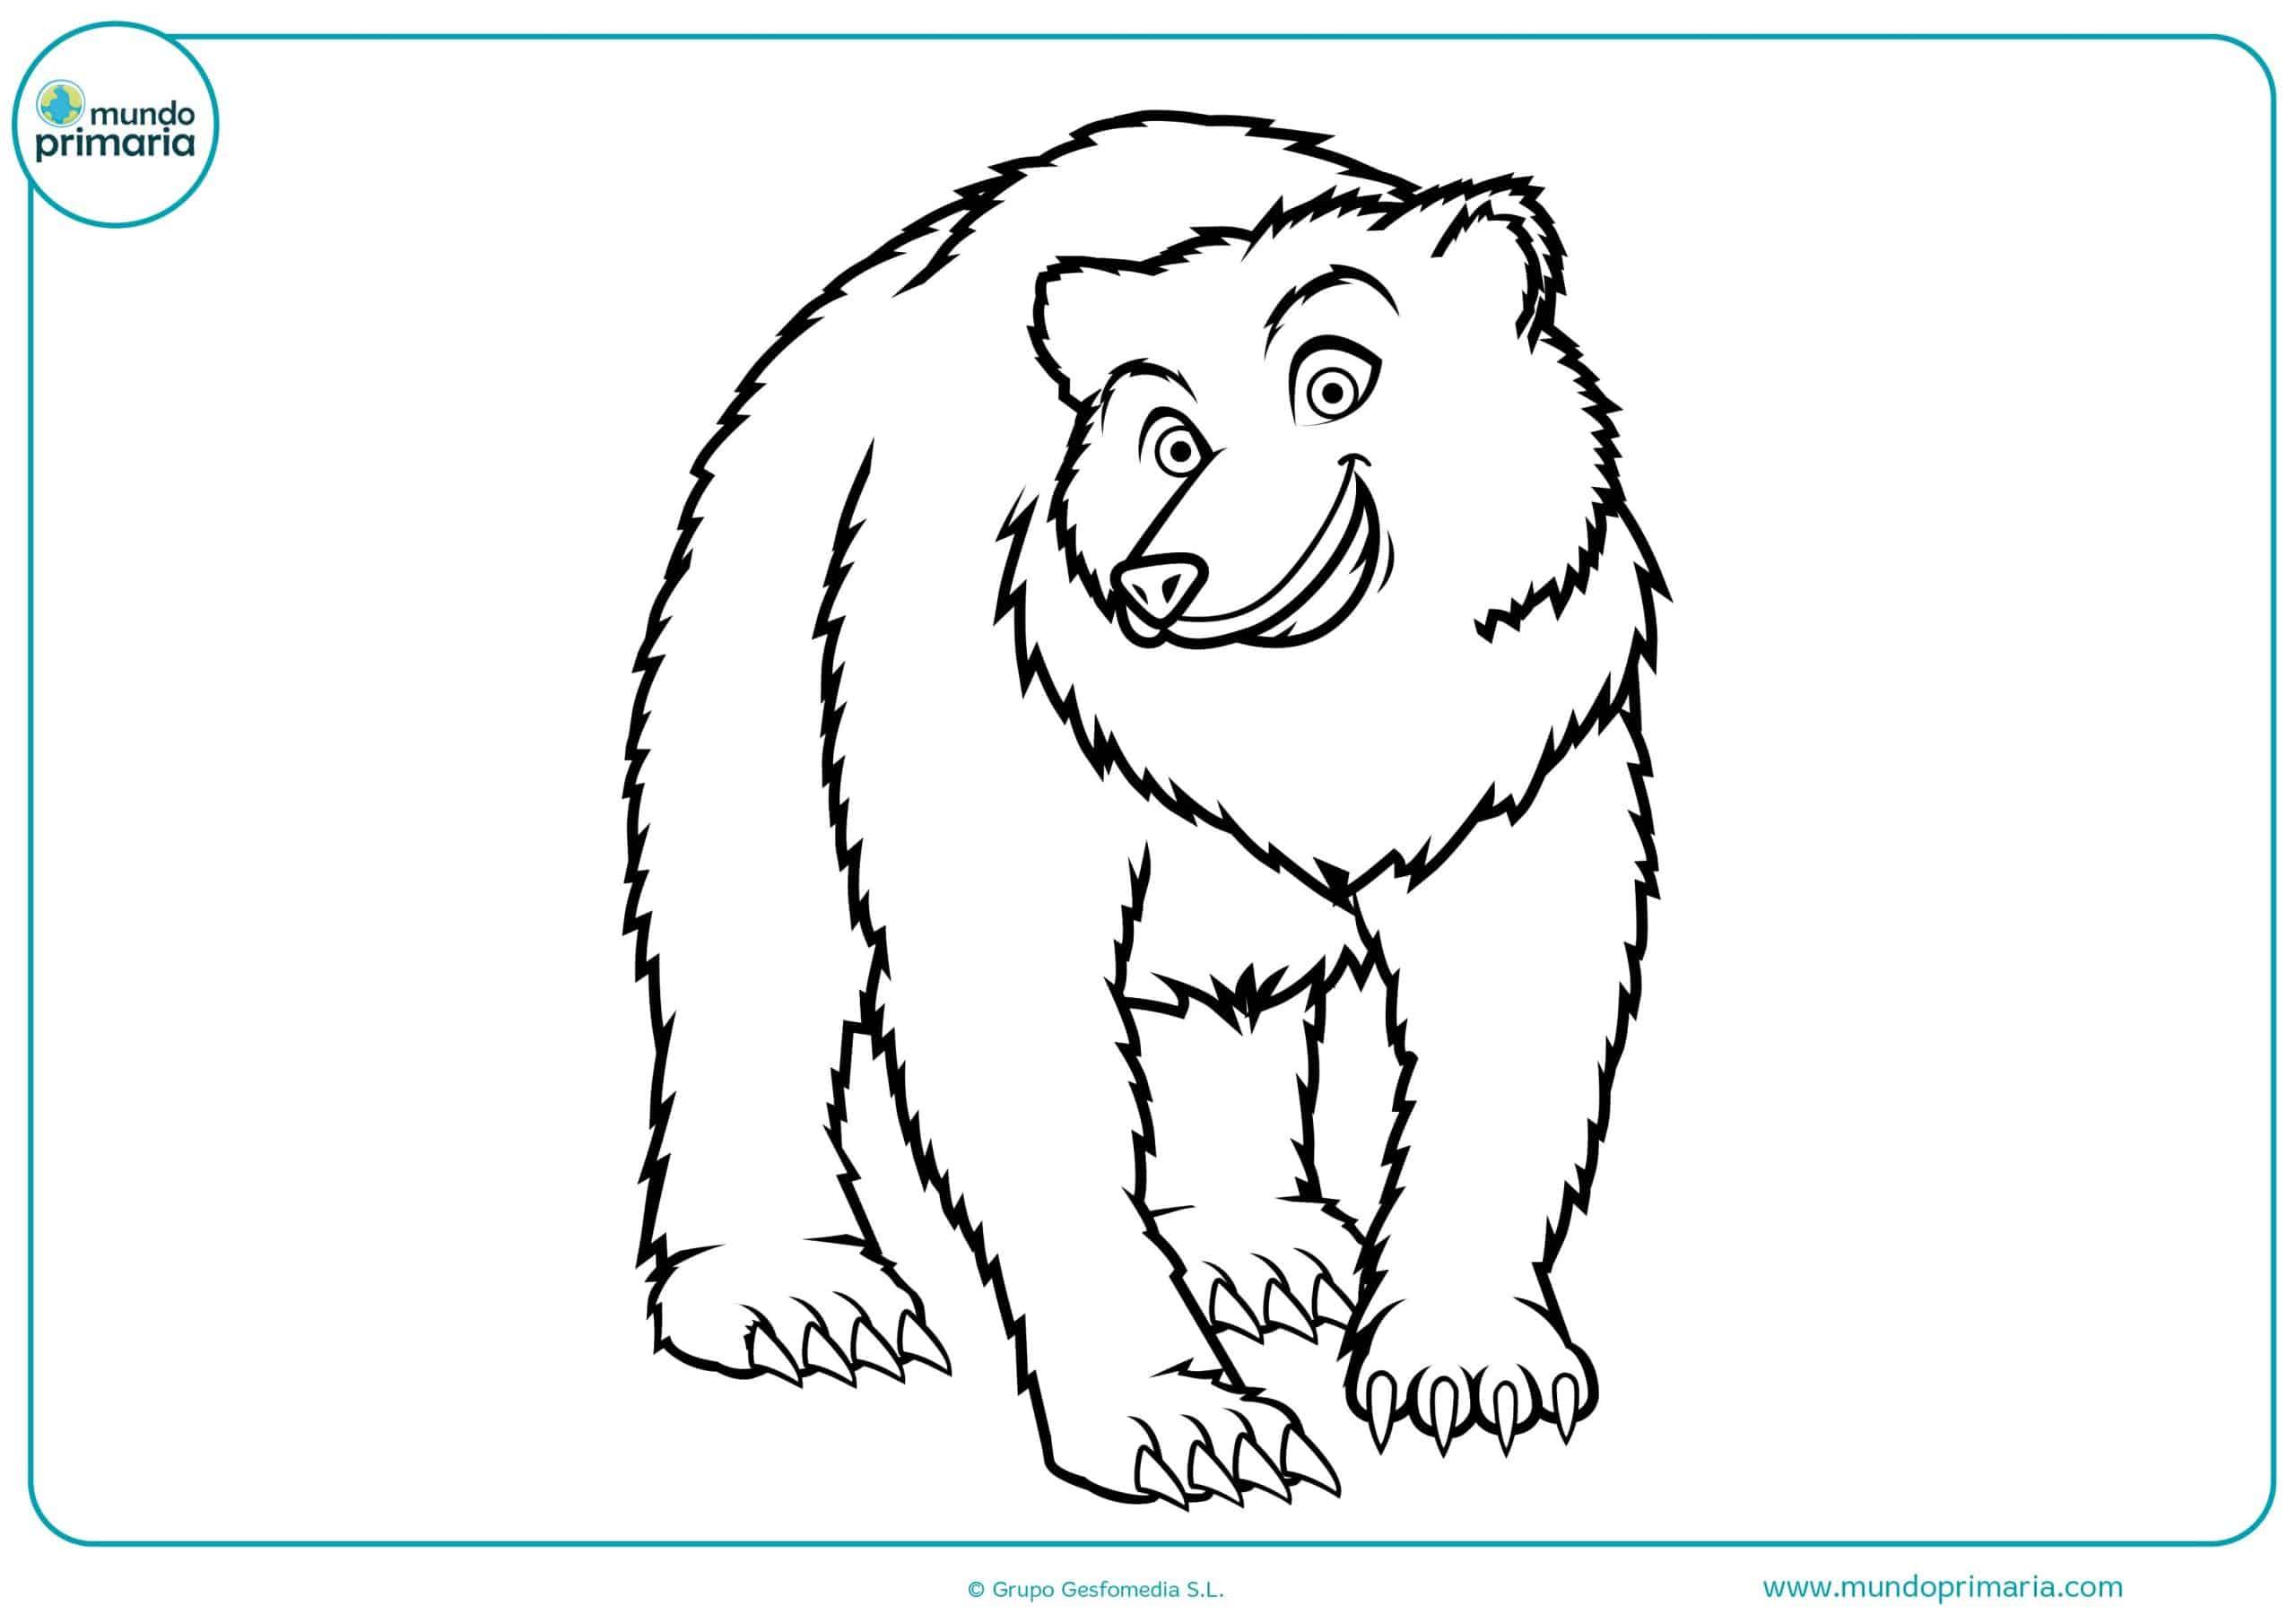 Dibujos Para Pintar Online De Disney I: Juegos De Pintar Para Ninos